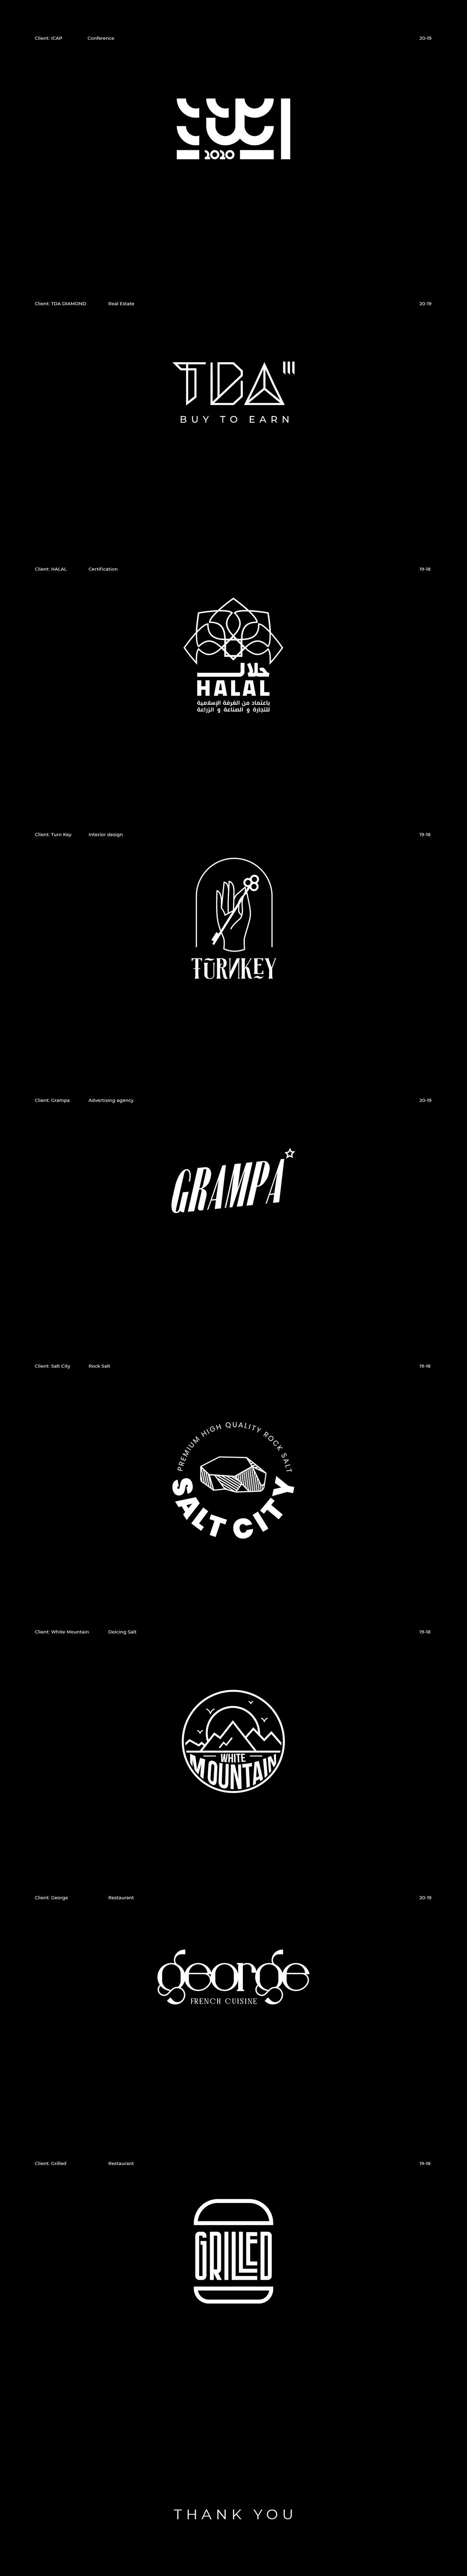 agency Beautiful body brand branding  conference creative design logo restaurant